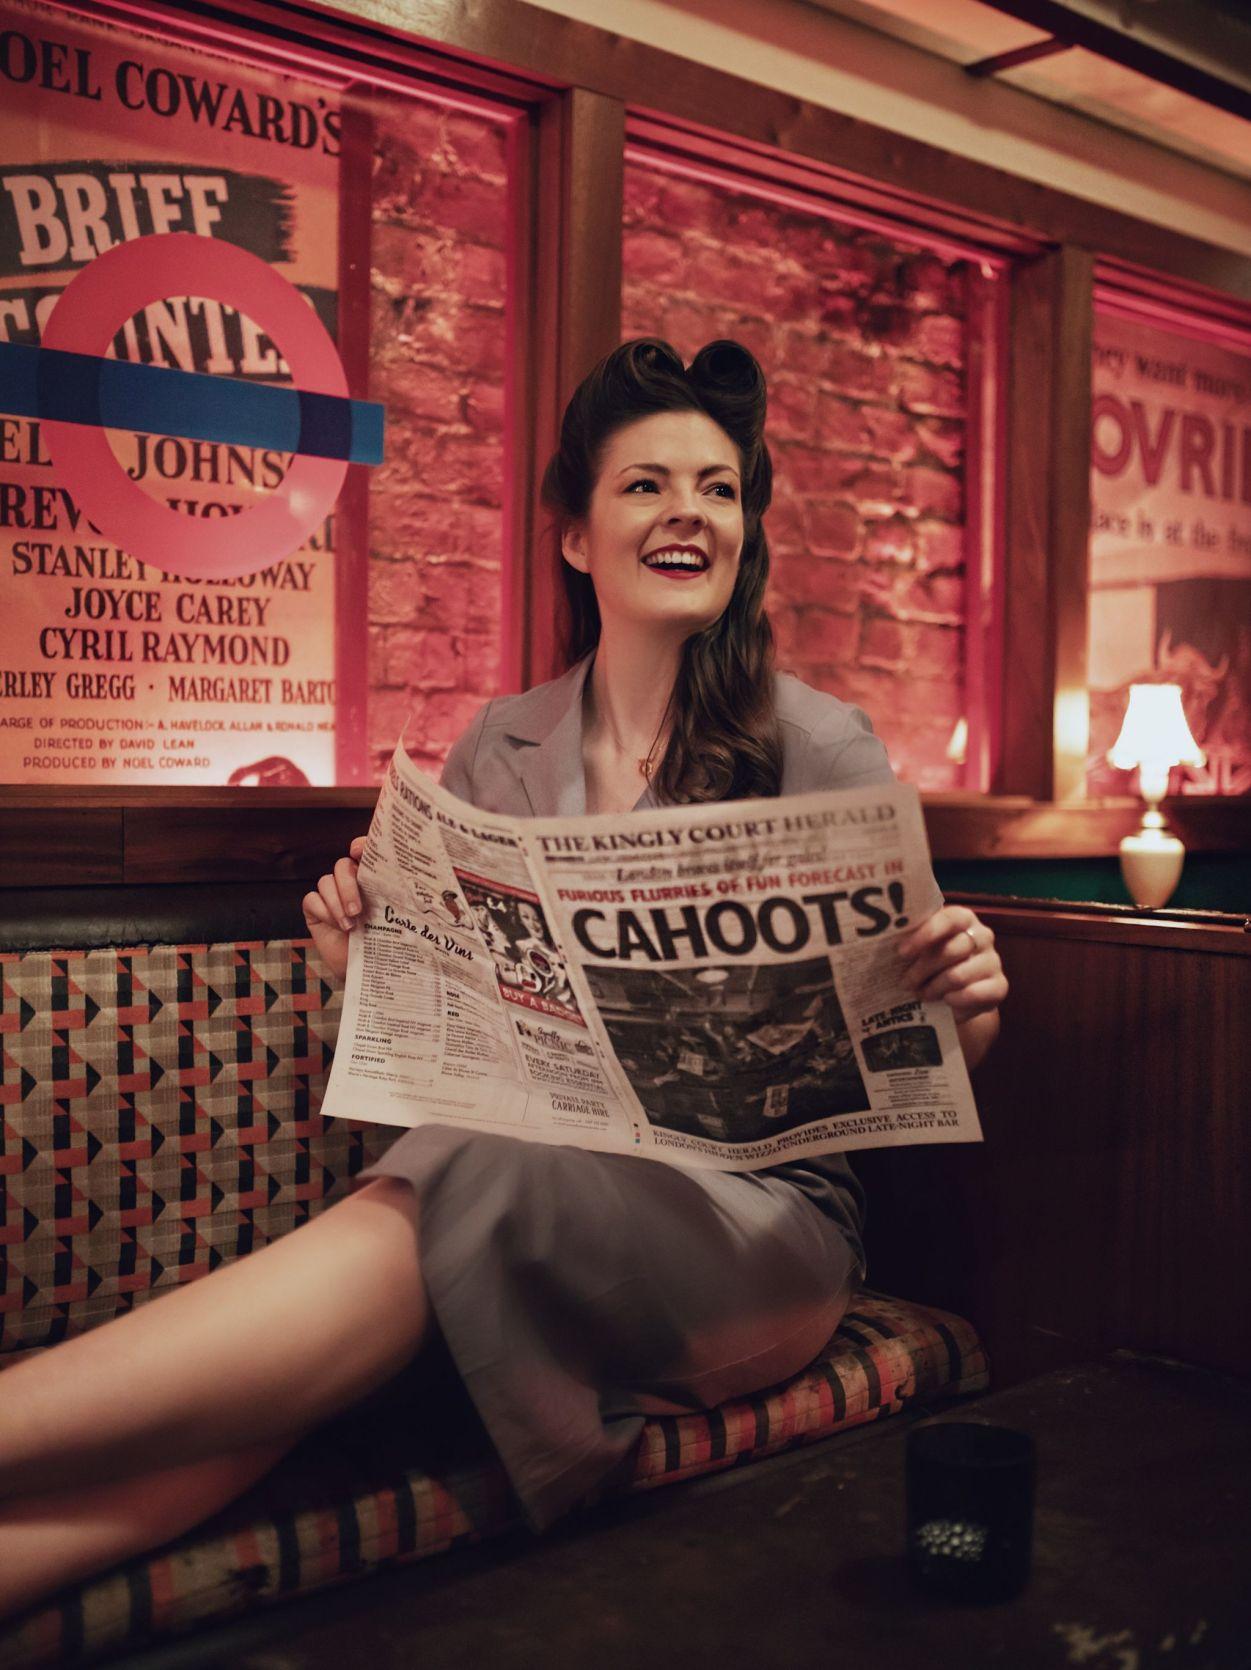 1940's Vintage Kate Winney Decades Cahoots Bar